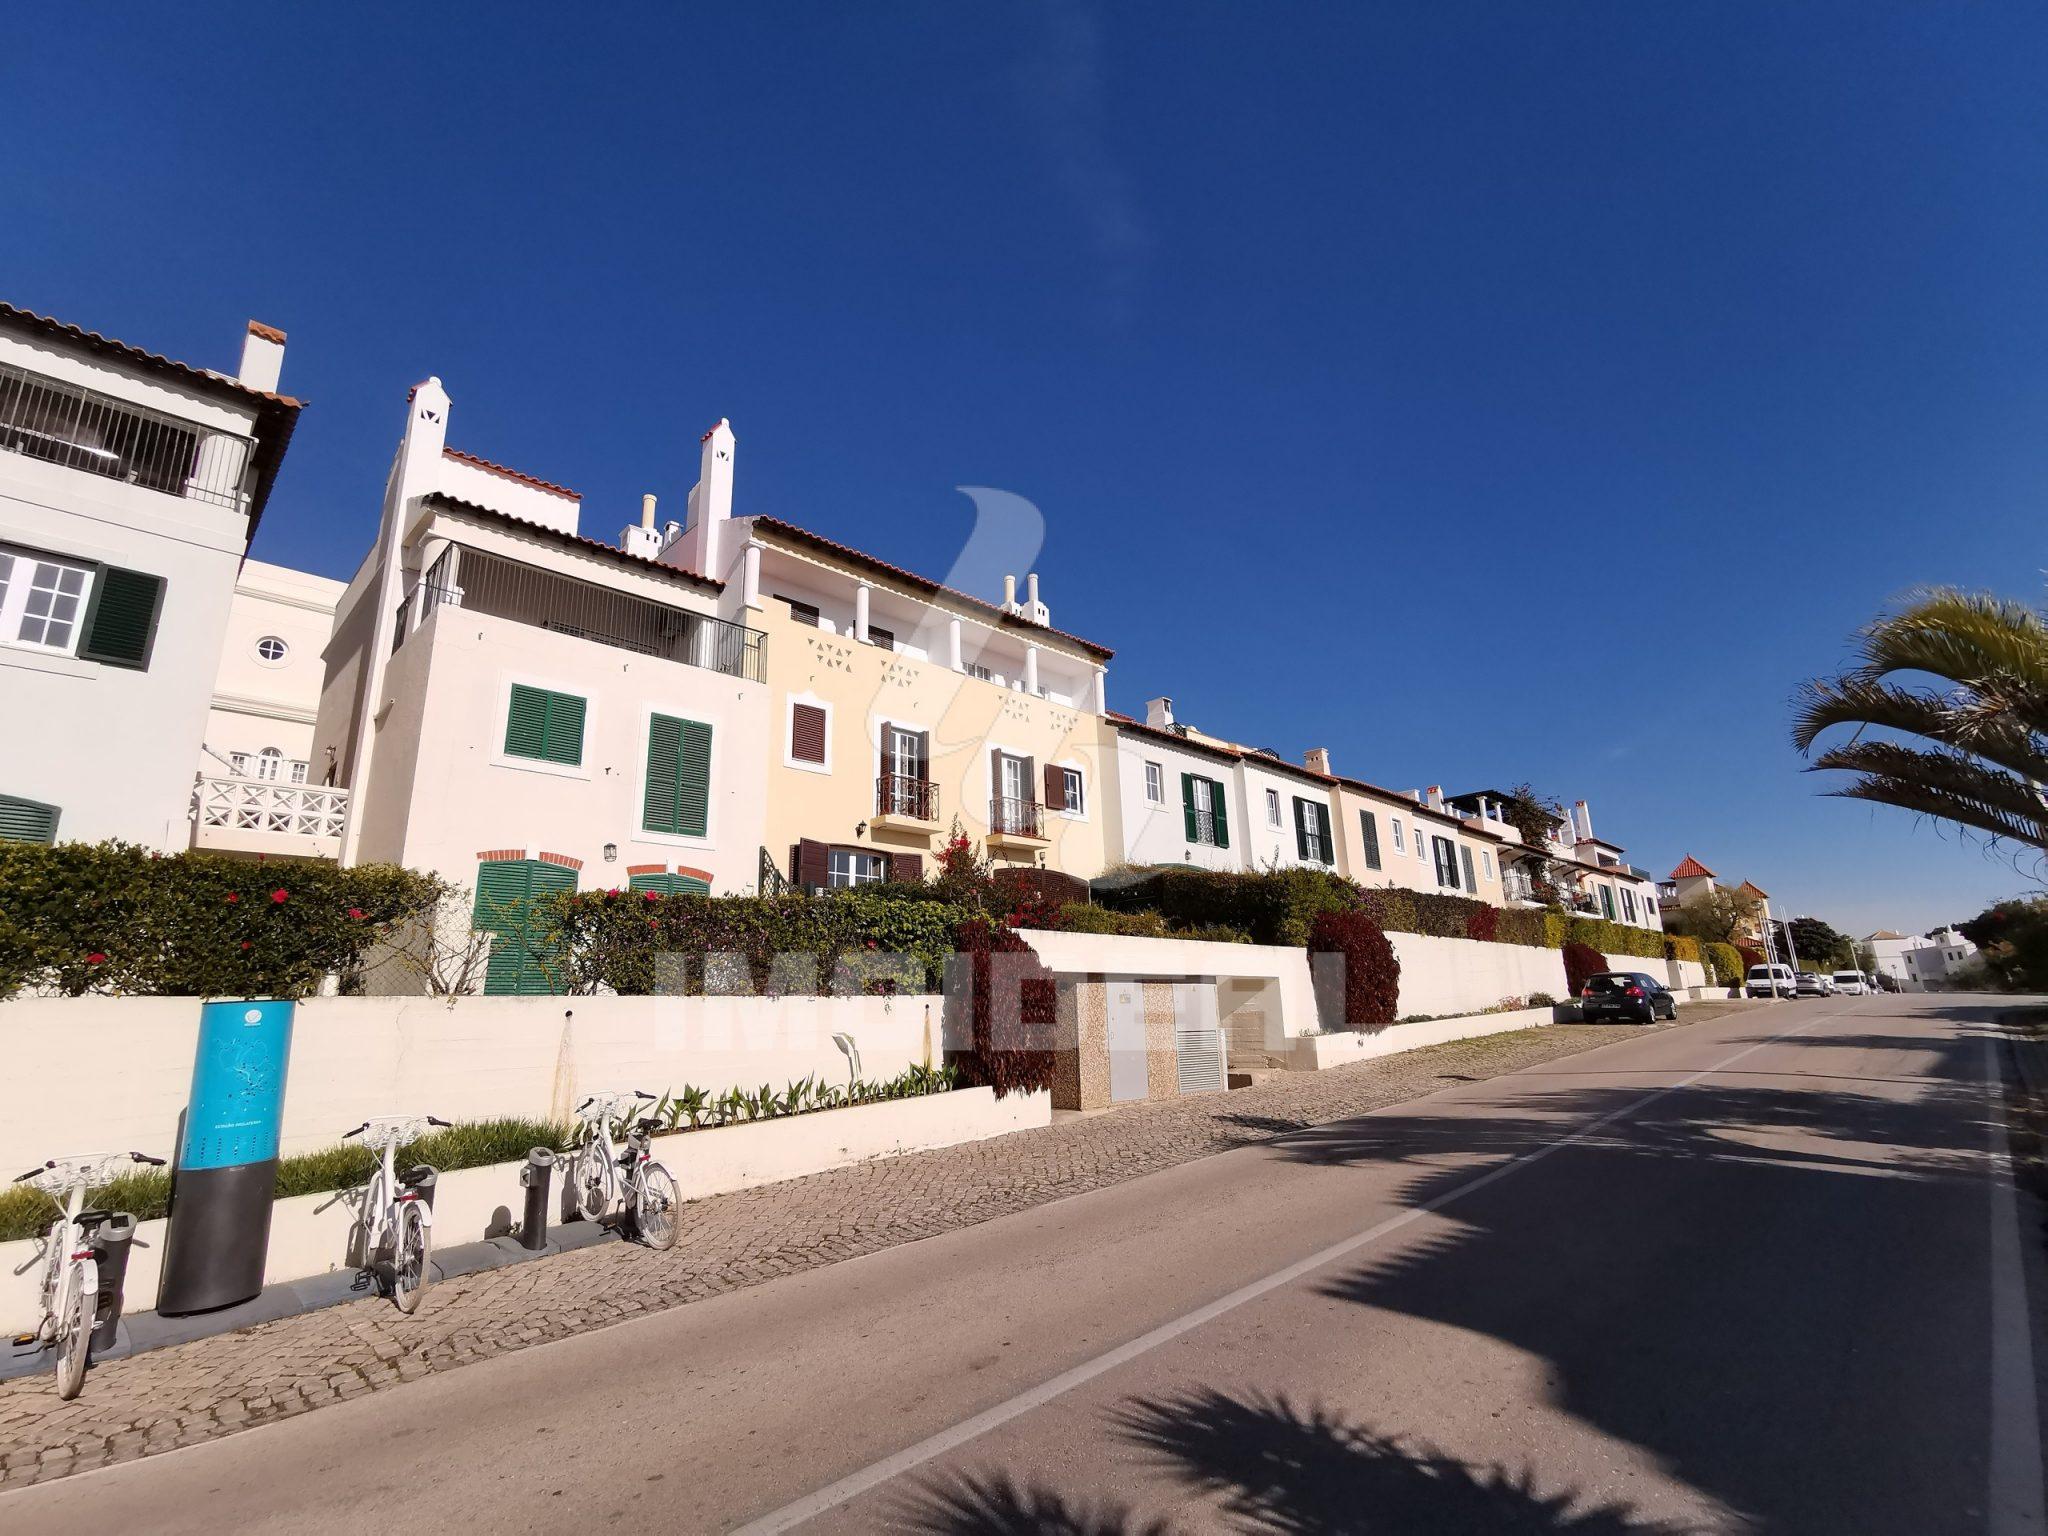 Moradia V5 em Old Village Vilamoura